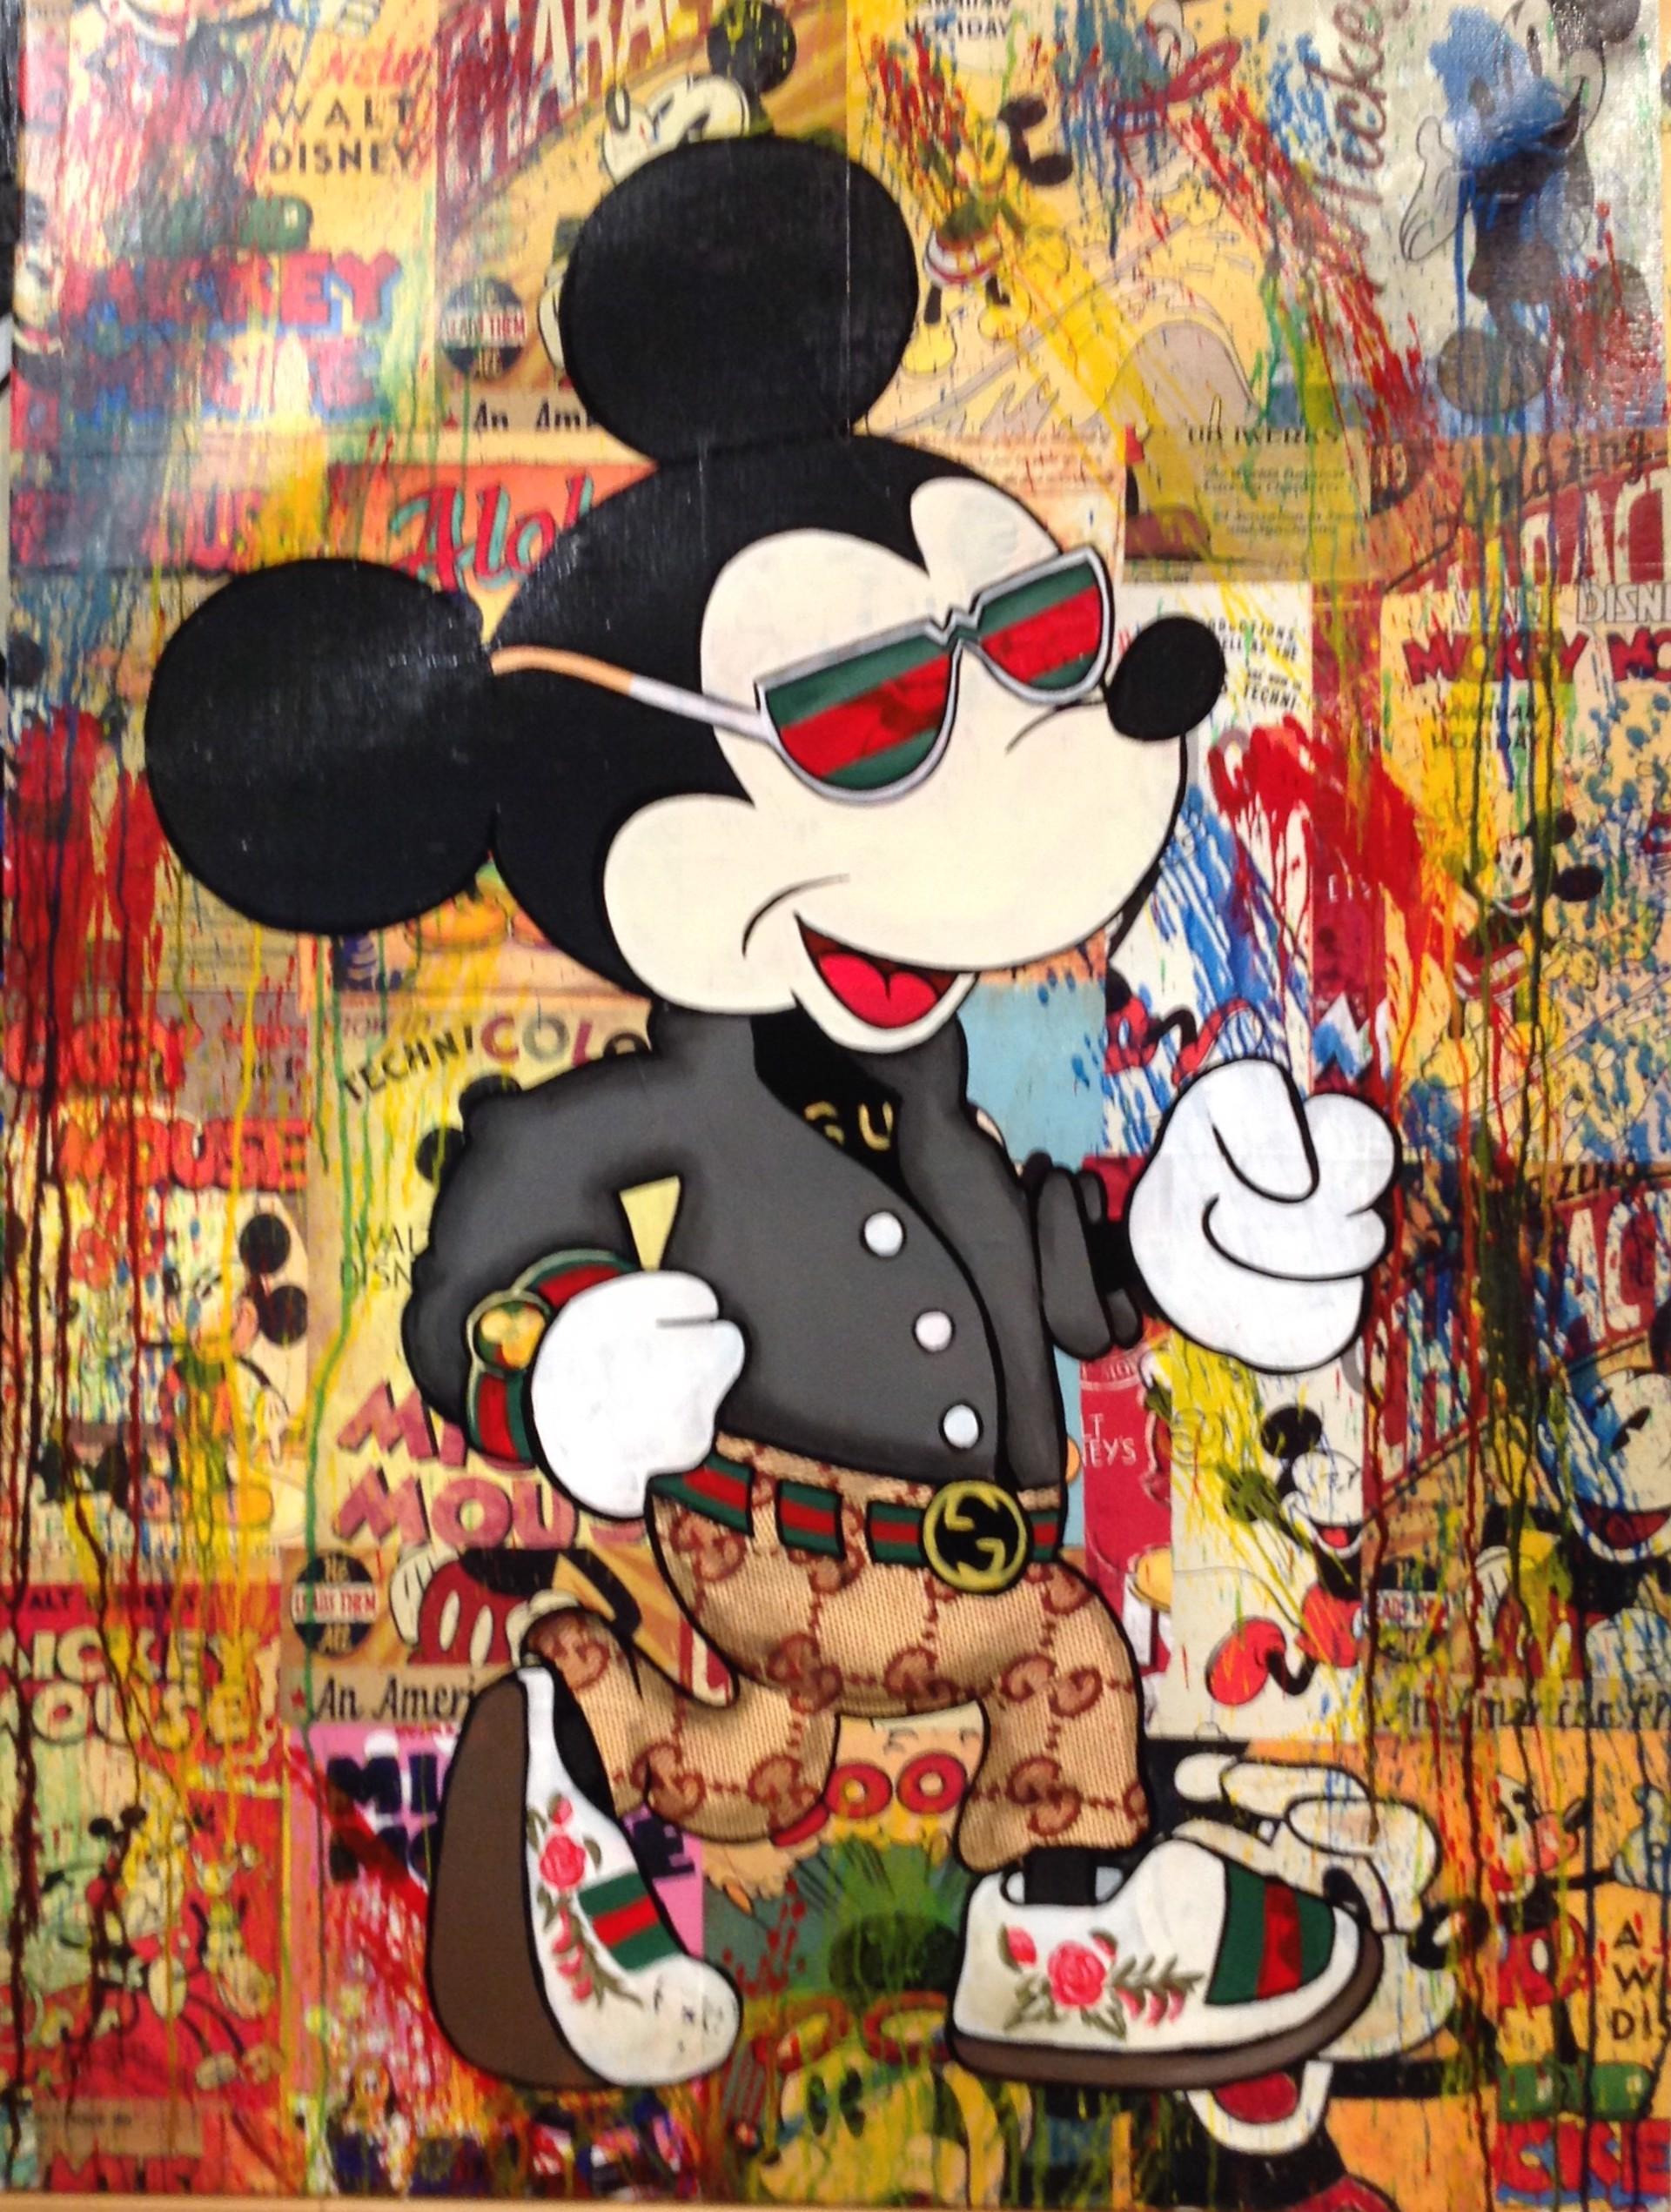 """Gucci Mickey"" by Buma Project"